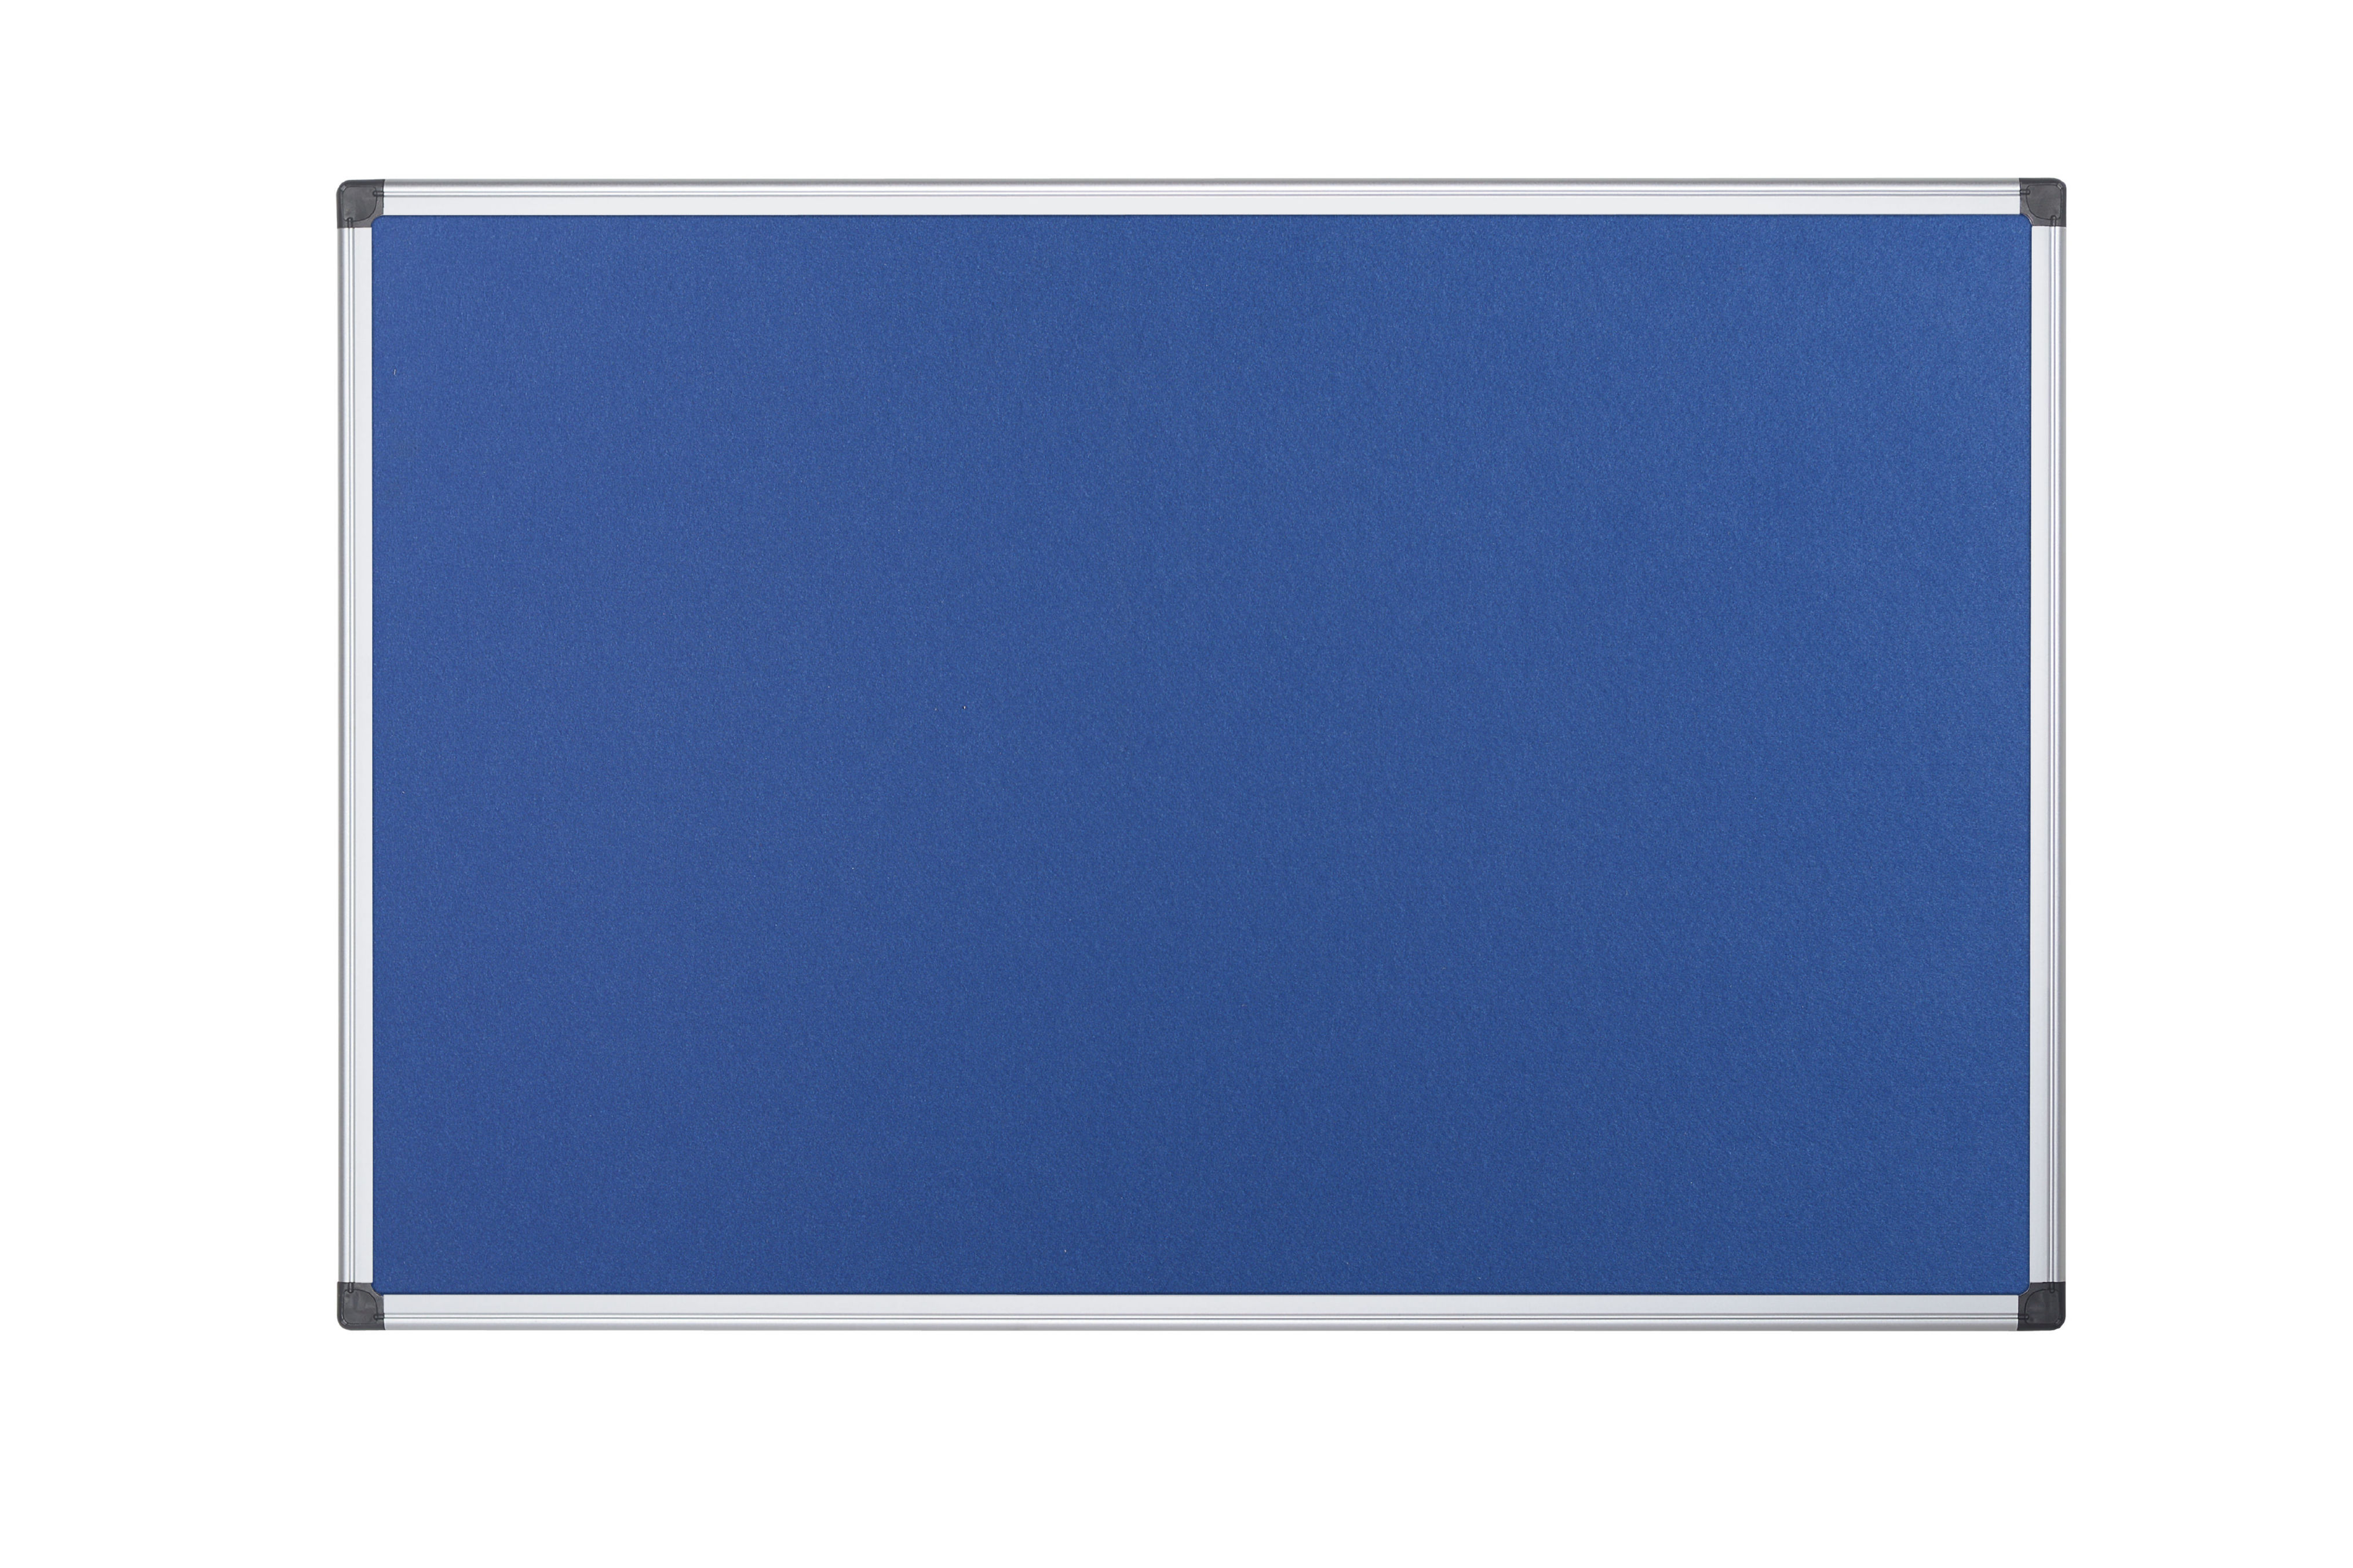 Felt Bi-Office Maya Blue Felt Ntcbrd Alu Frame 240x120cm